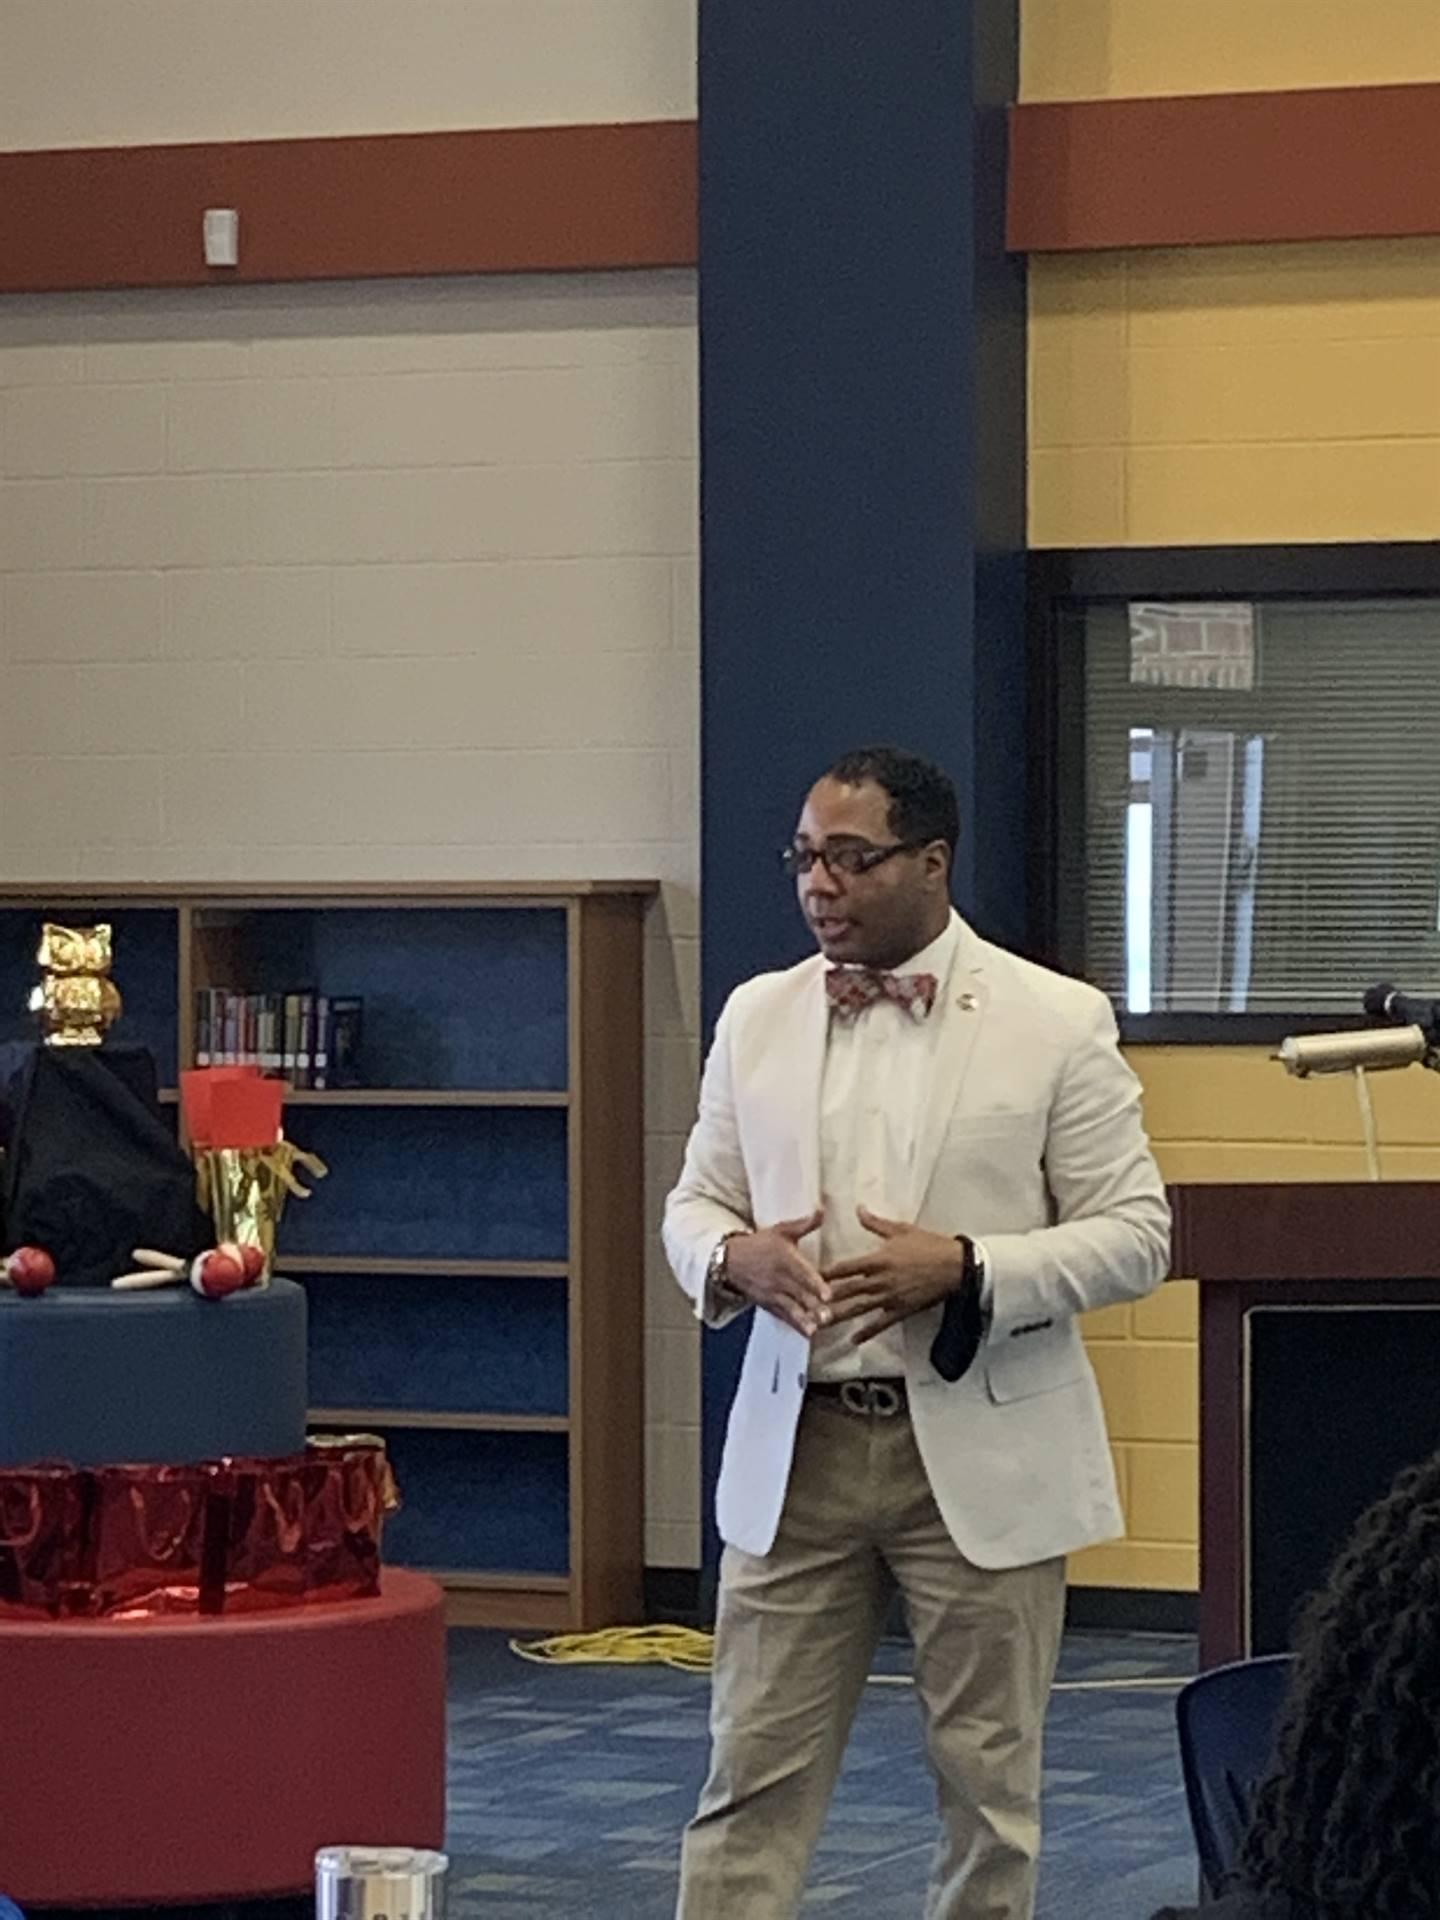 Dr. Berger presenting